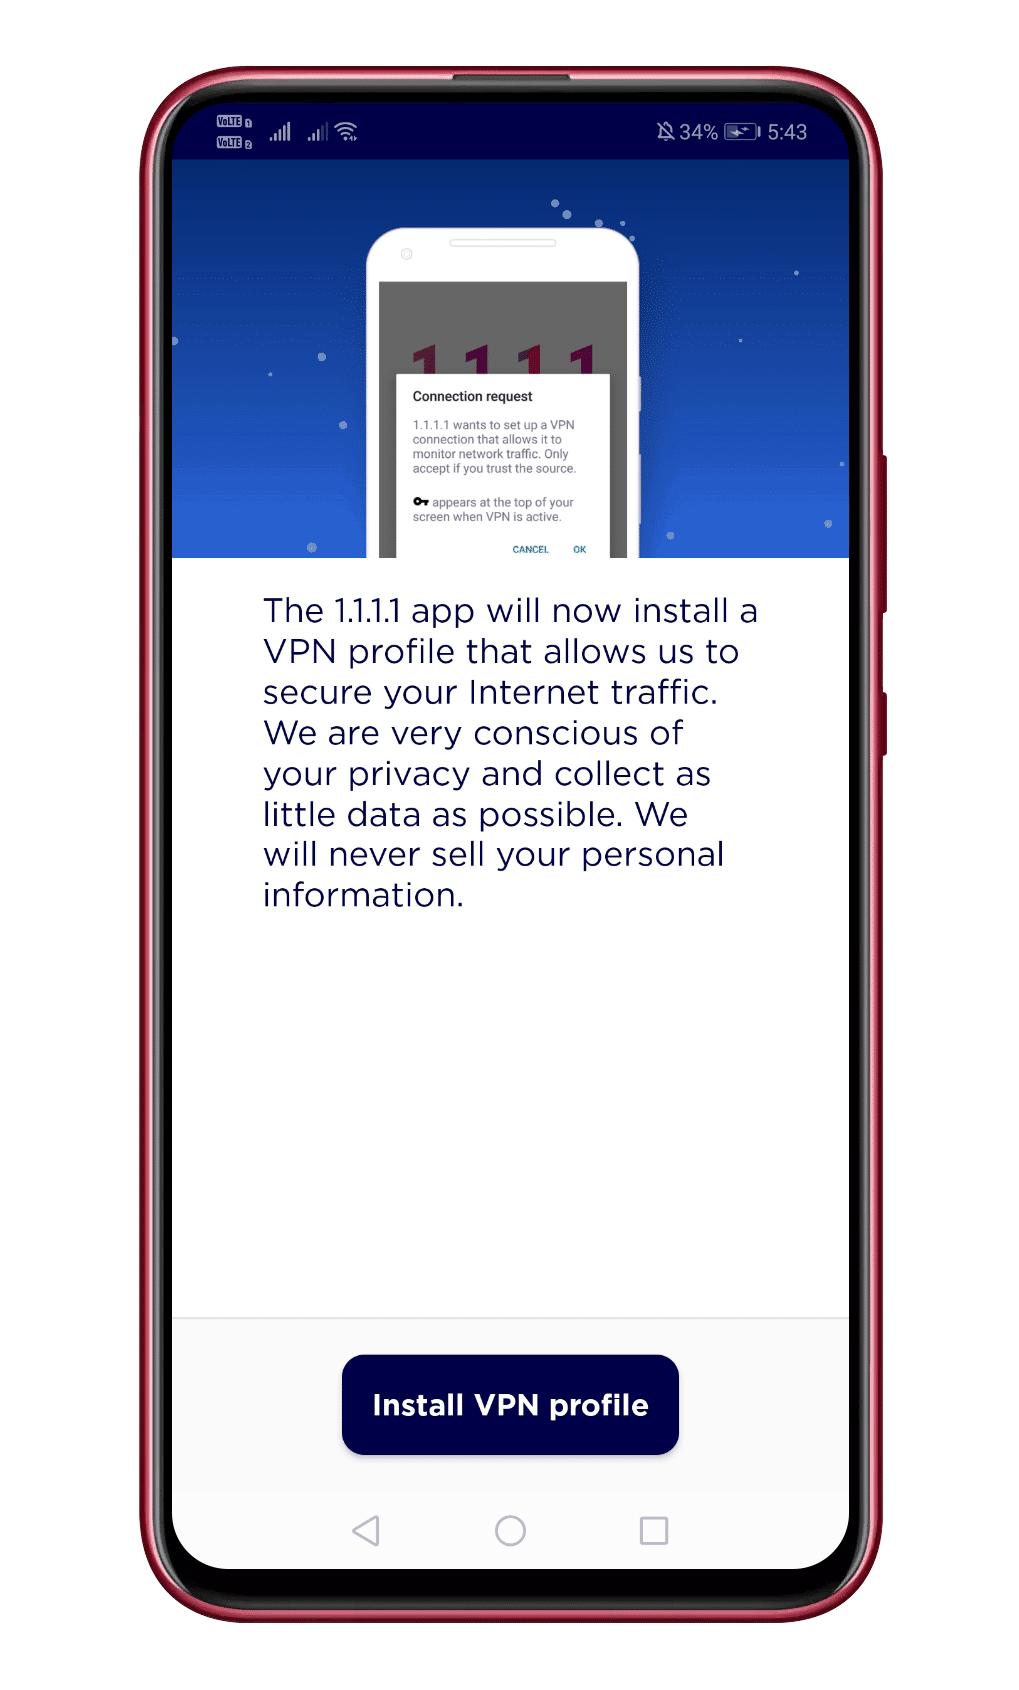 Tap On 'Install VPN Profile'